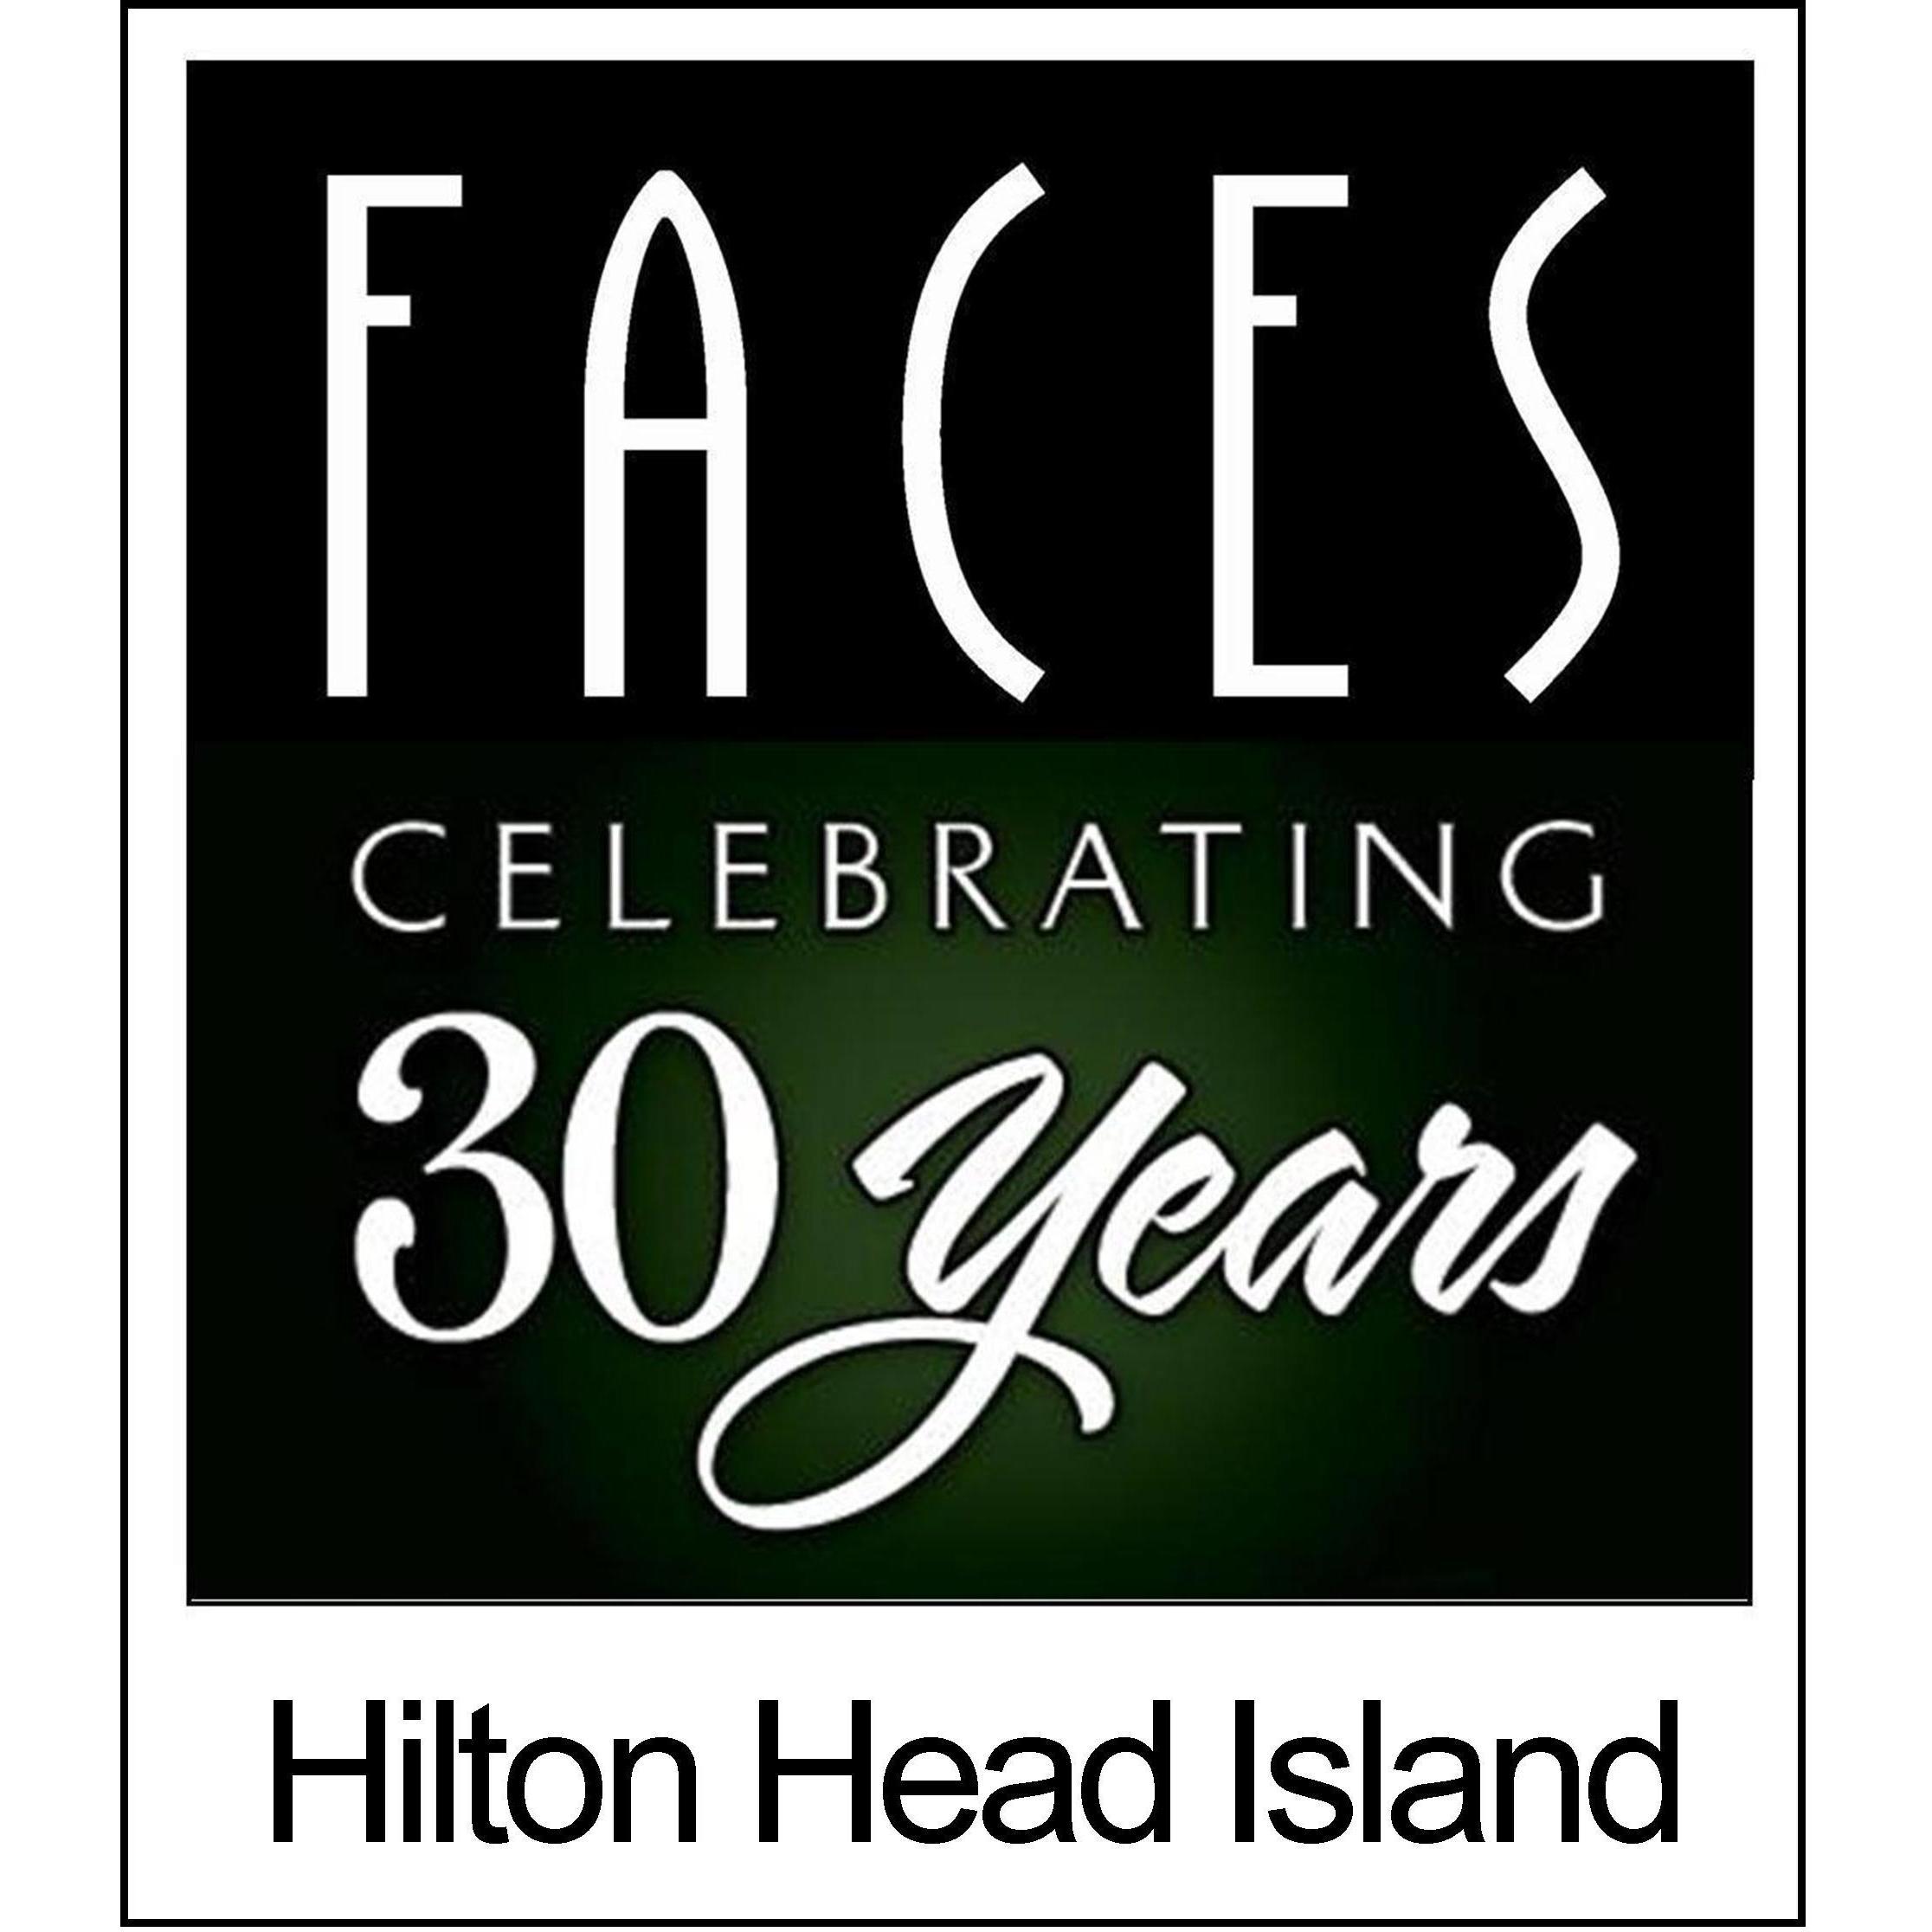 FACES DaySpa - Hilton Head Island, SC